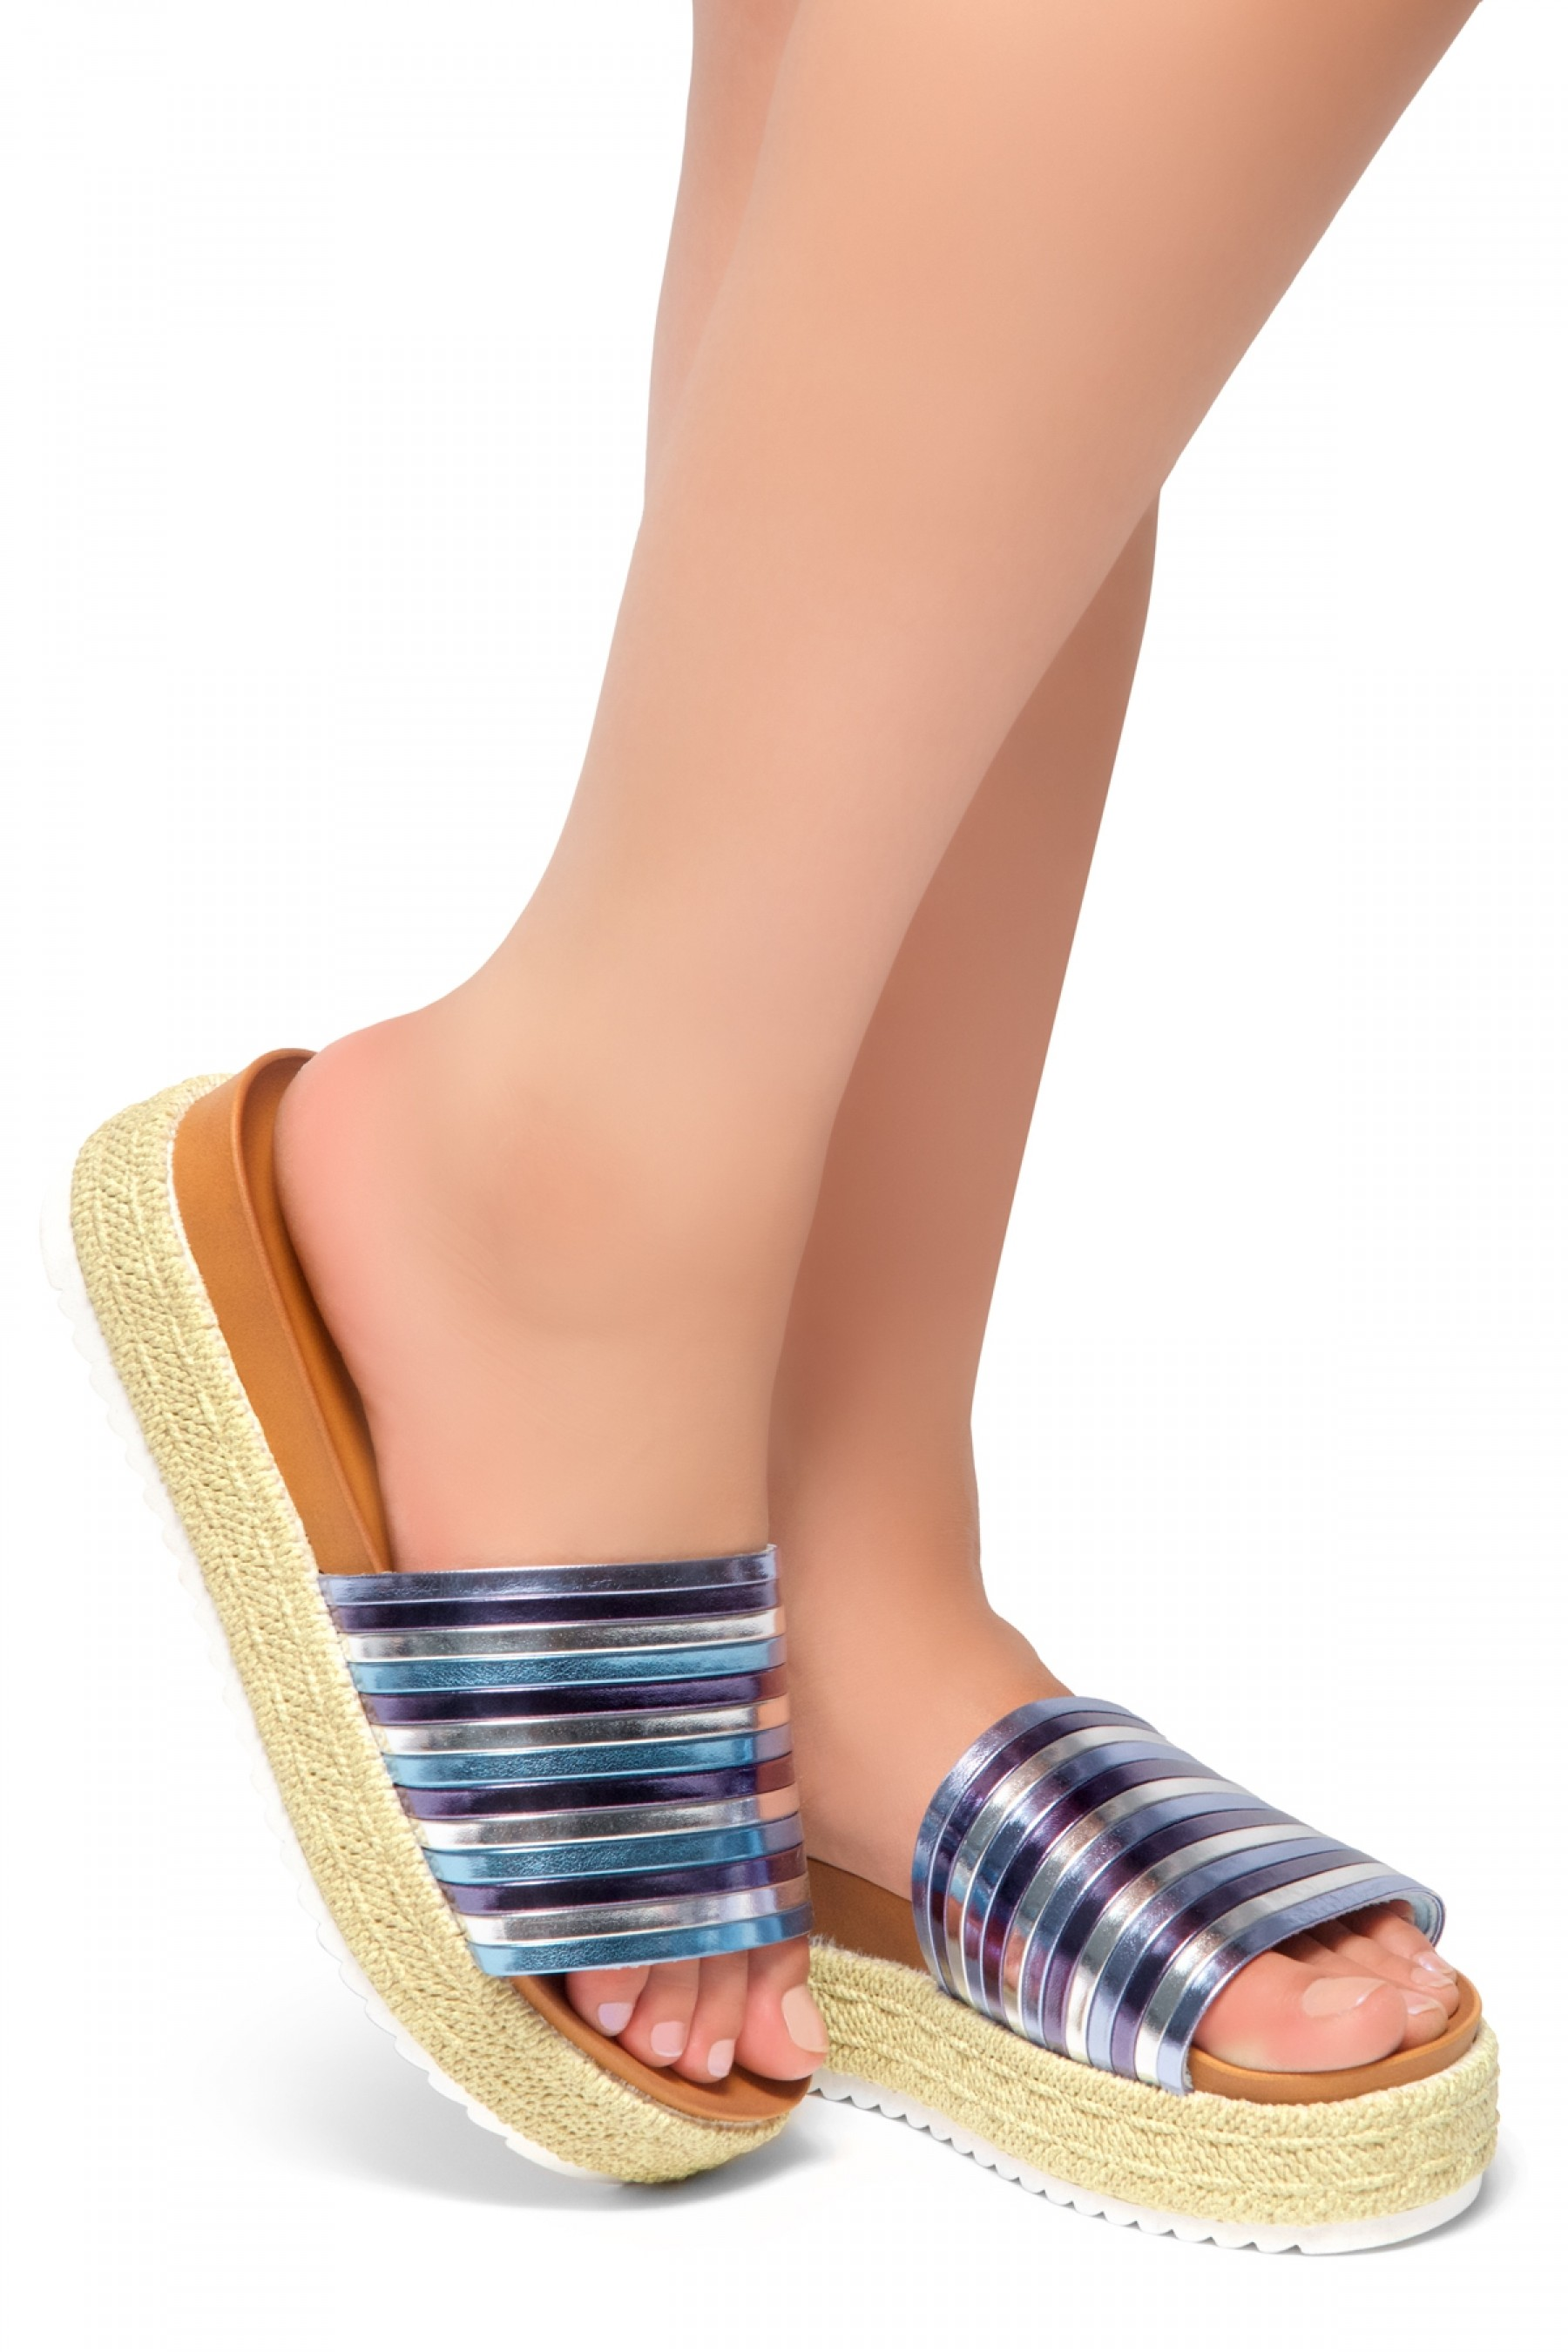 HerStyle Beast Coast-Multi Colors Vamp Platform Open Toe Slide Sandal (BlueMulti)